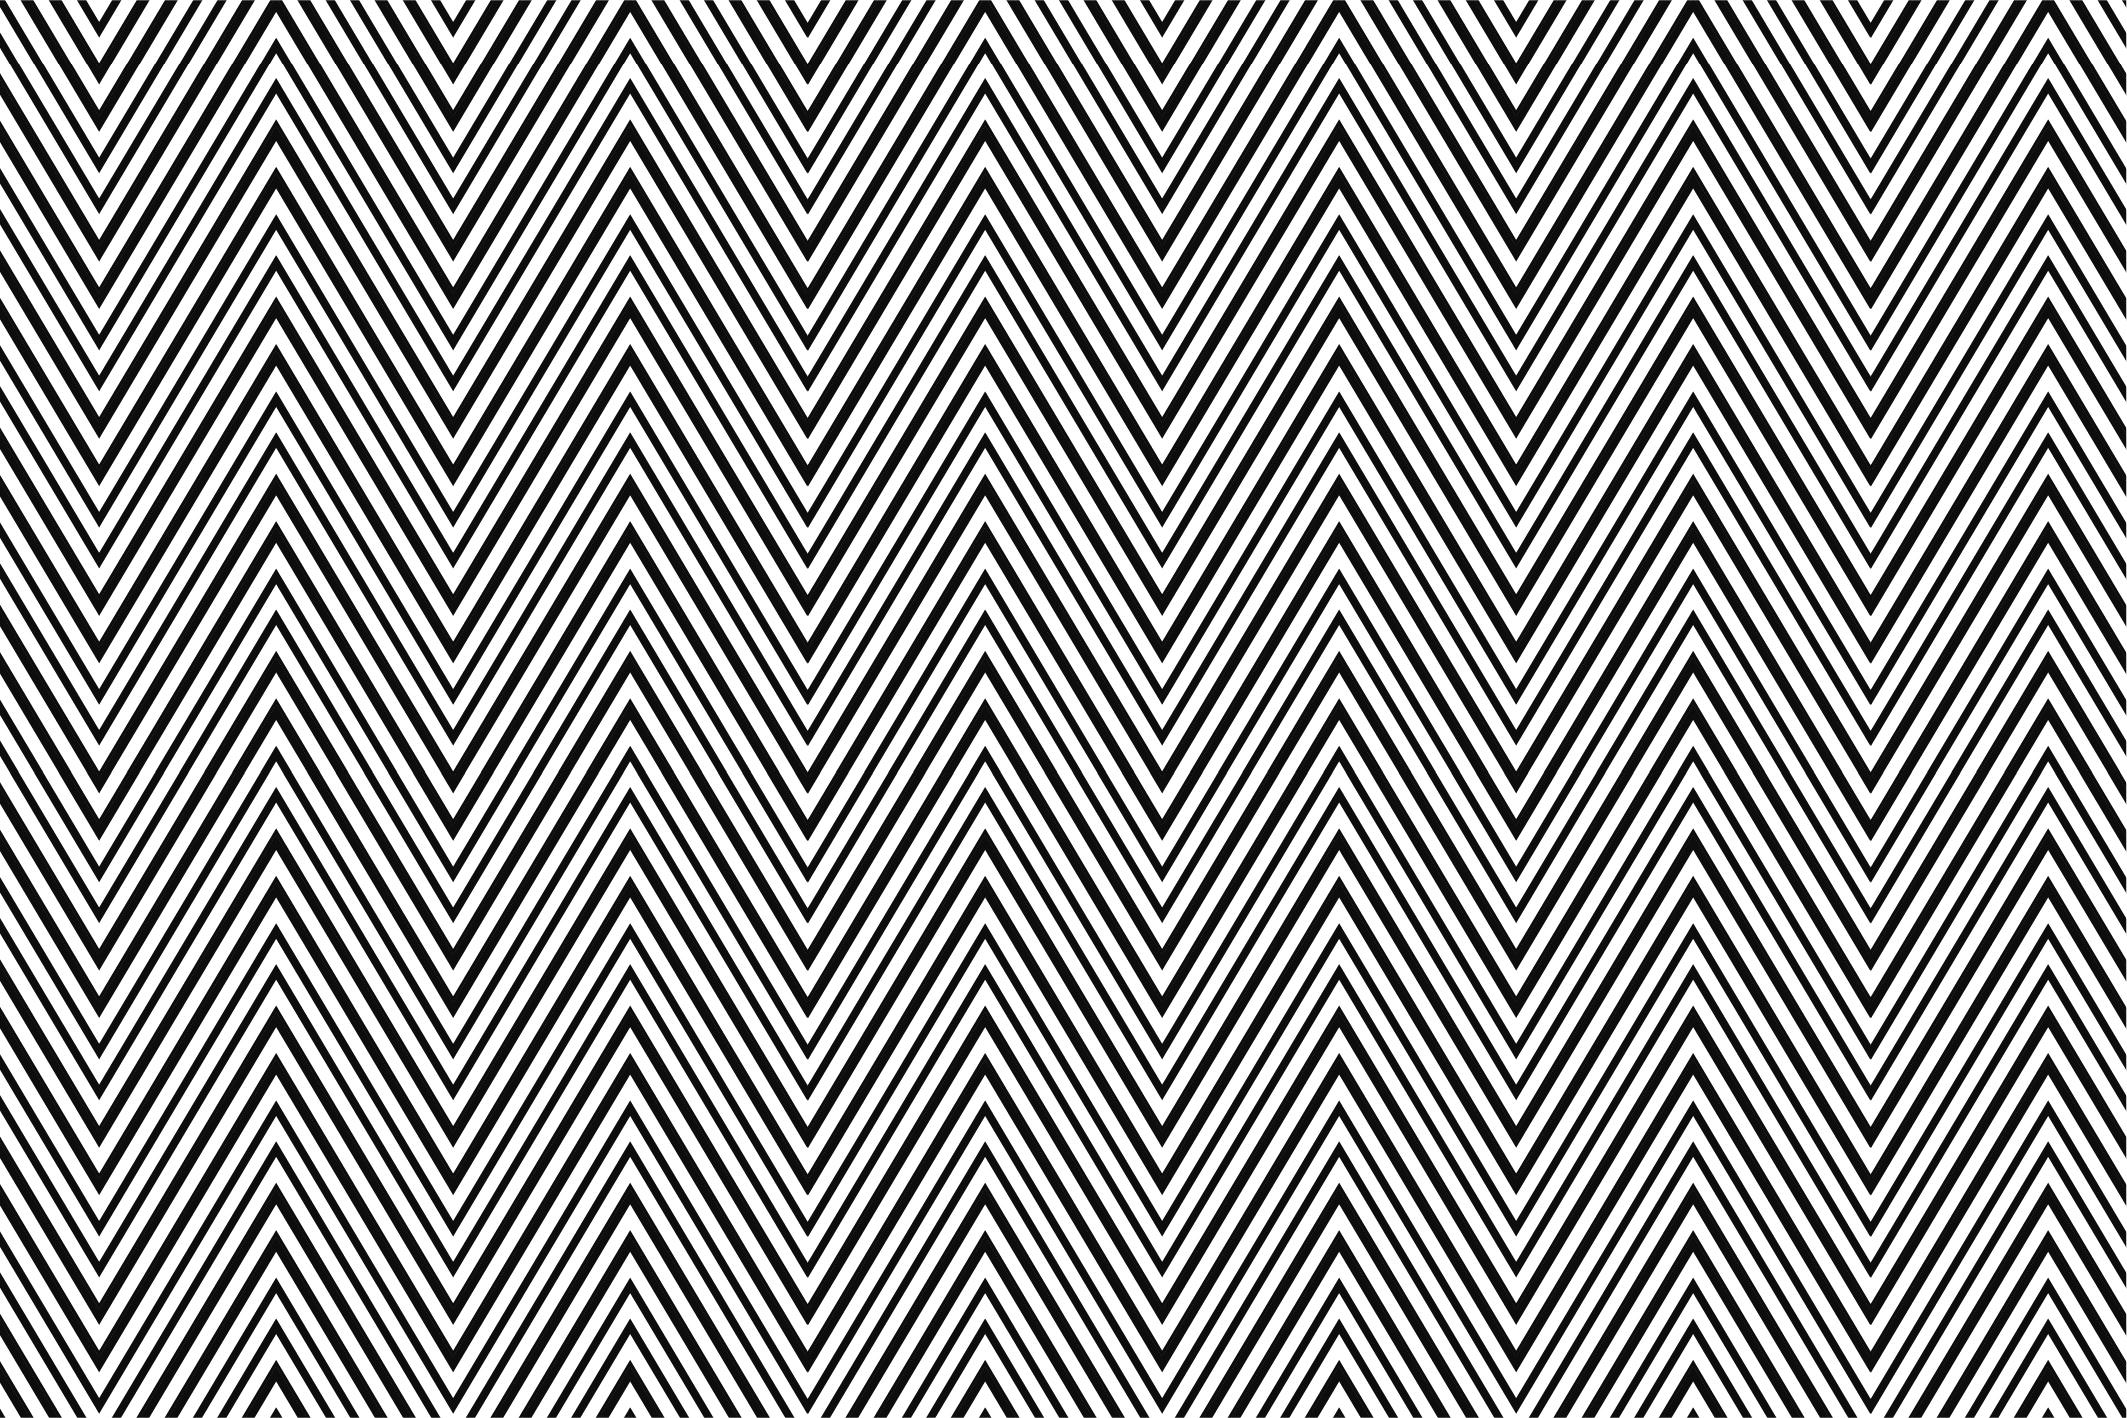 Wave&Zigzag seamless patterns. B&W. example image 10